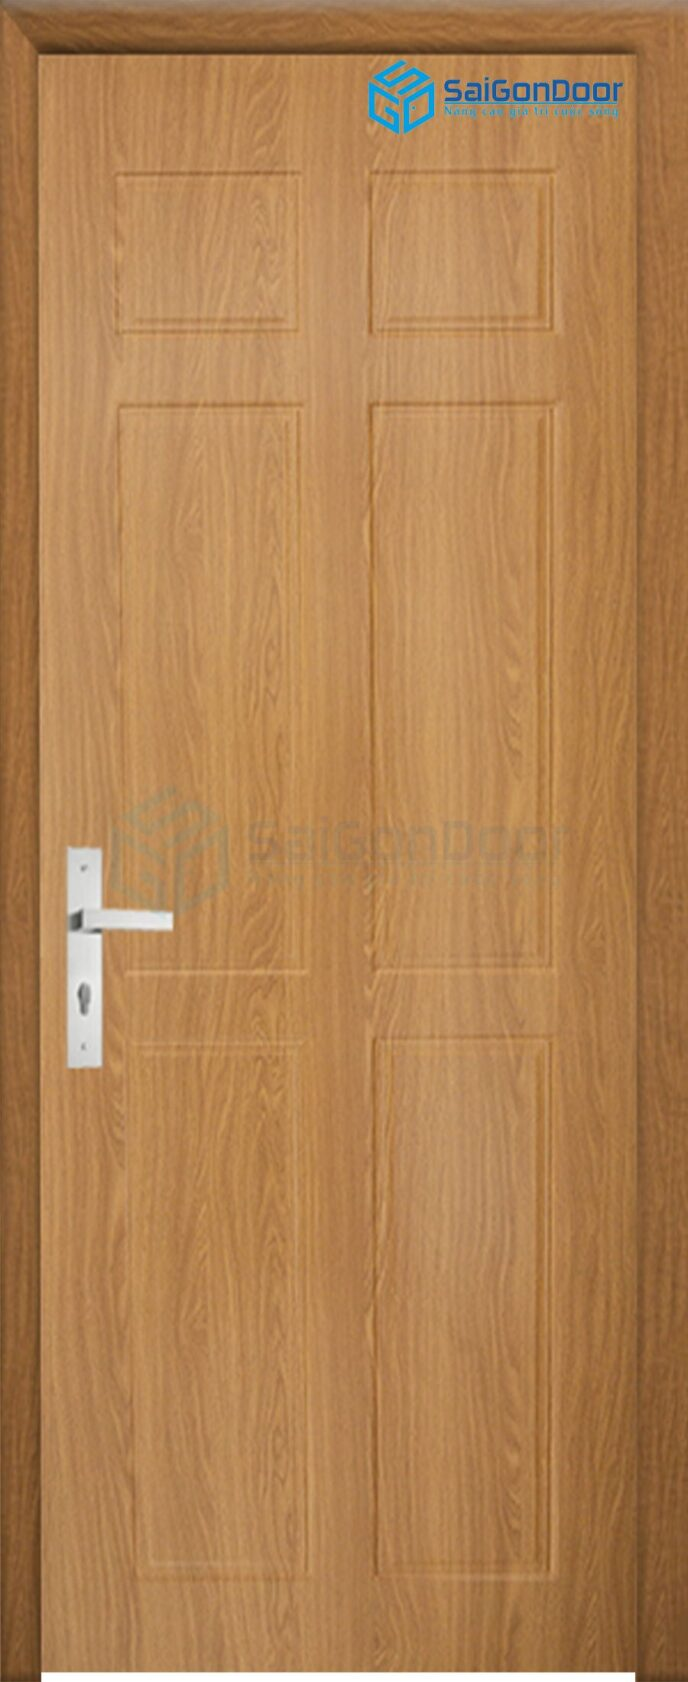 Cửa gỗ cao cấp Hàn Quốc SYB 205